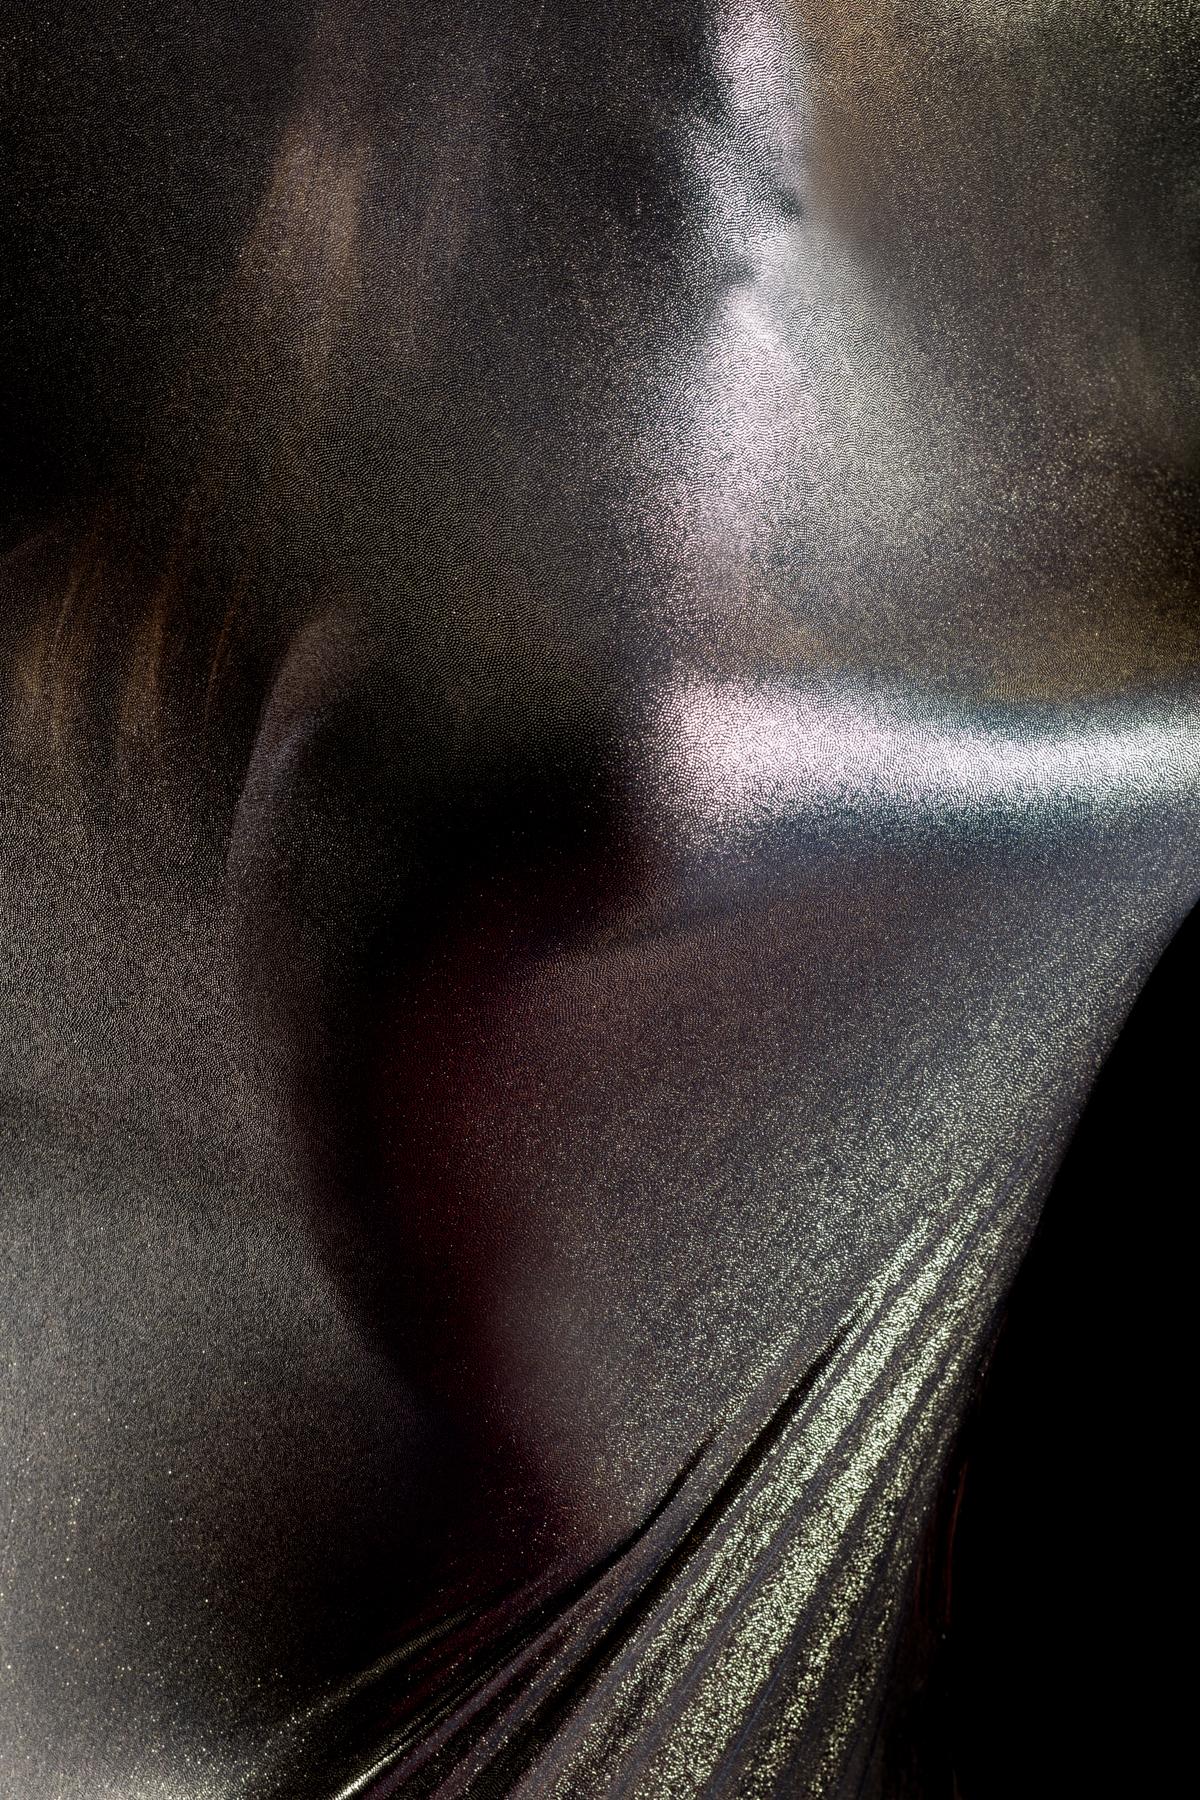 Ursula_Lelen_Beyond Limits_Resolve_4.jpg